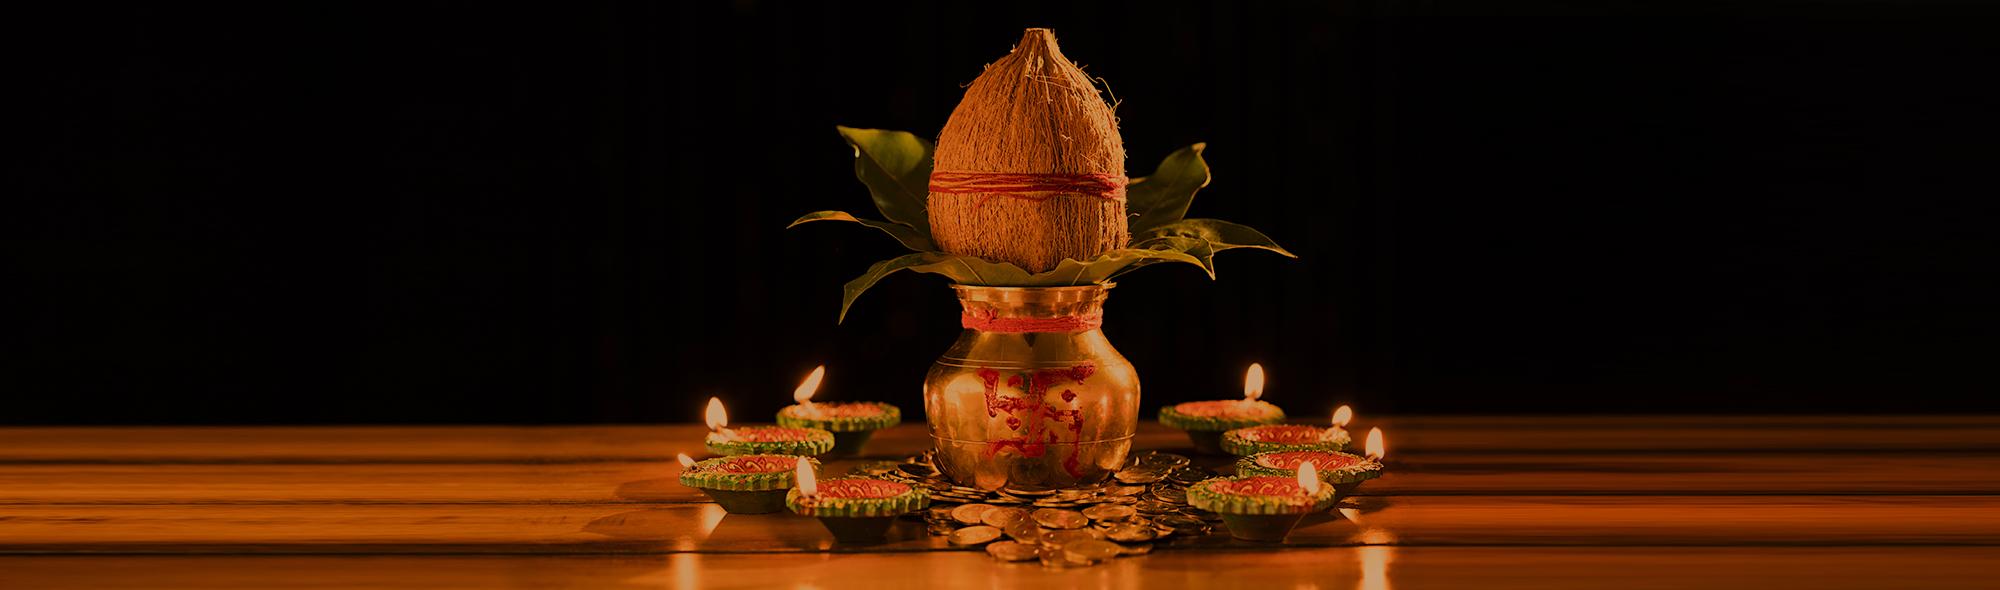 Buy gold this Akshaya Tritiya to mark new beginnings